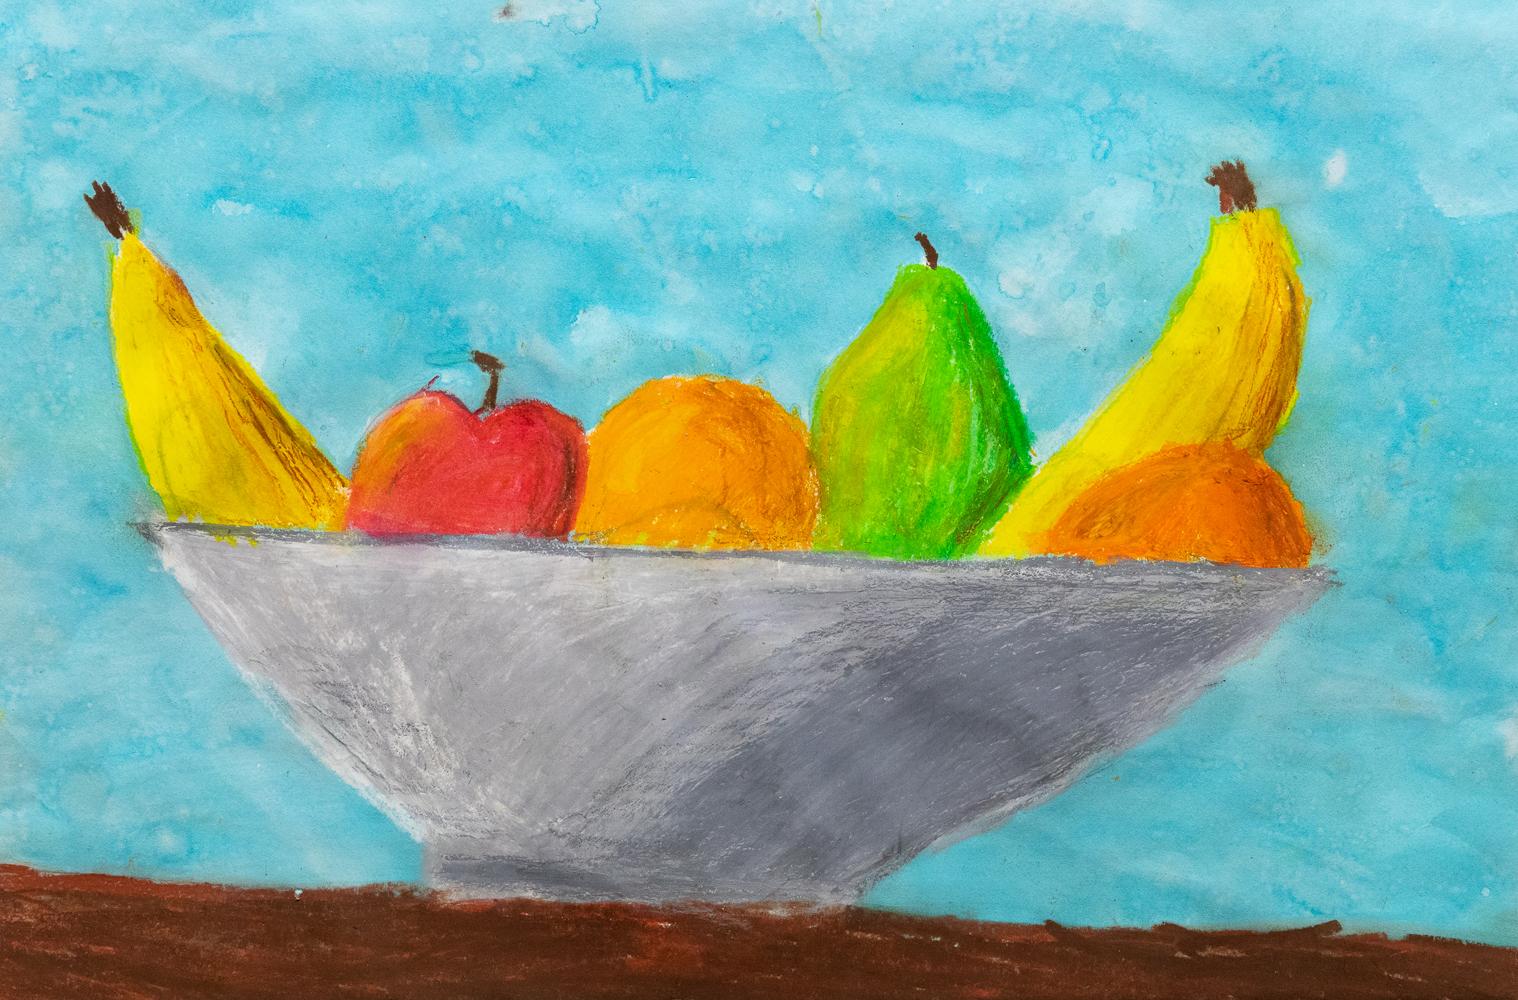 21. Ethan Wooldridge, 'Fruitious', oil pastel, wash,  Year 5, St Joseph's Primary School, Uralla